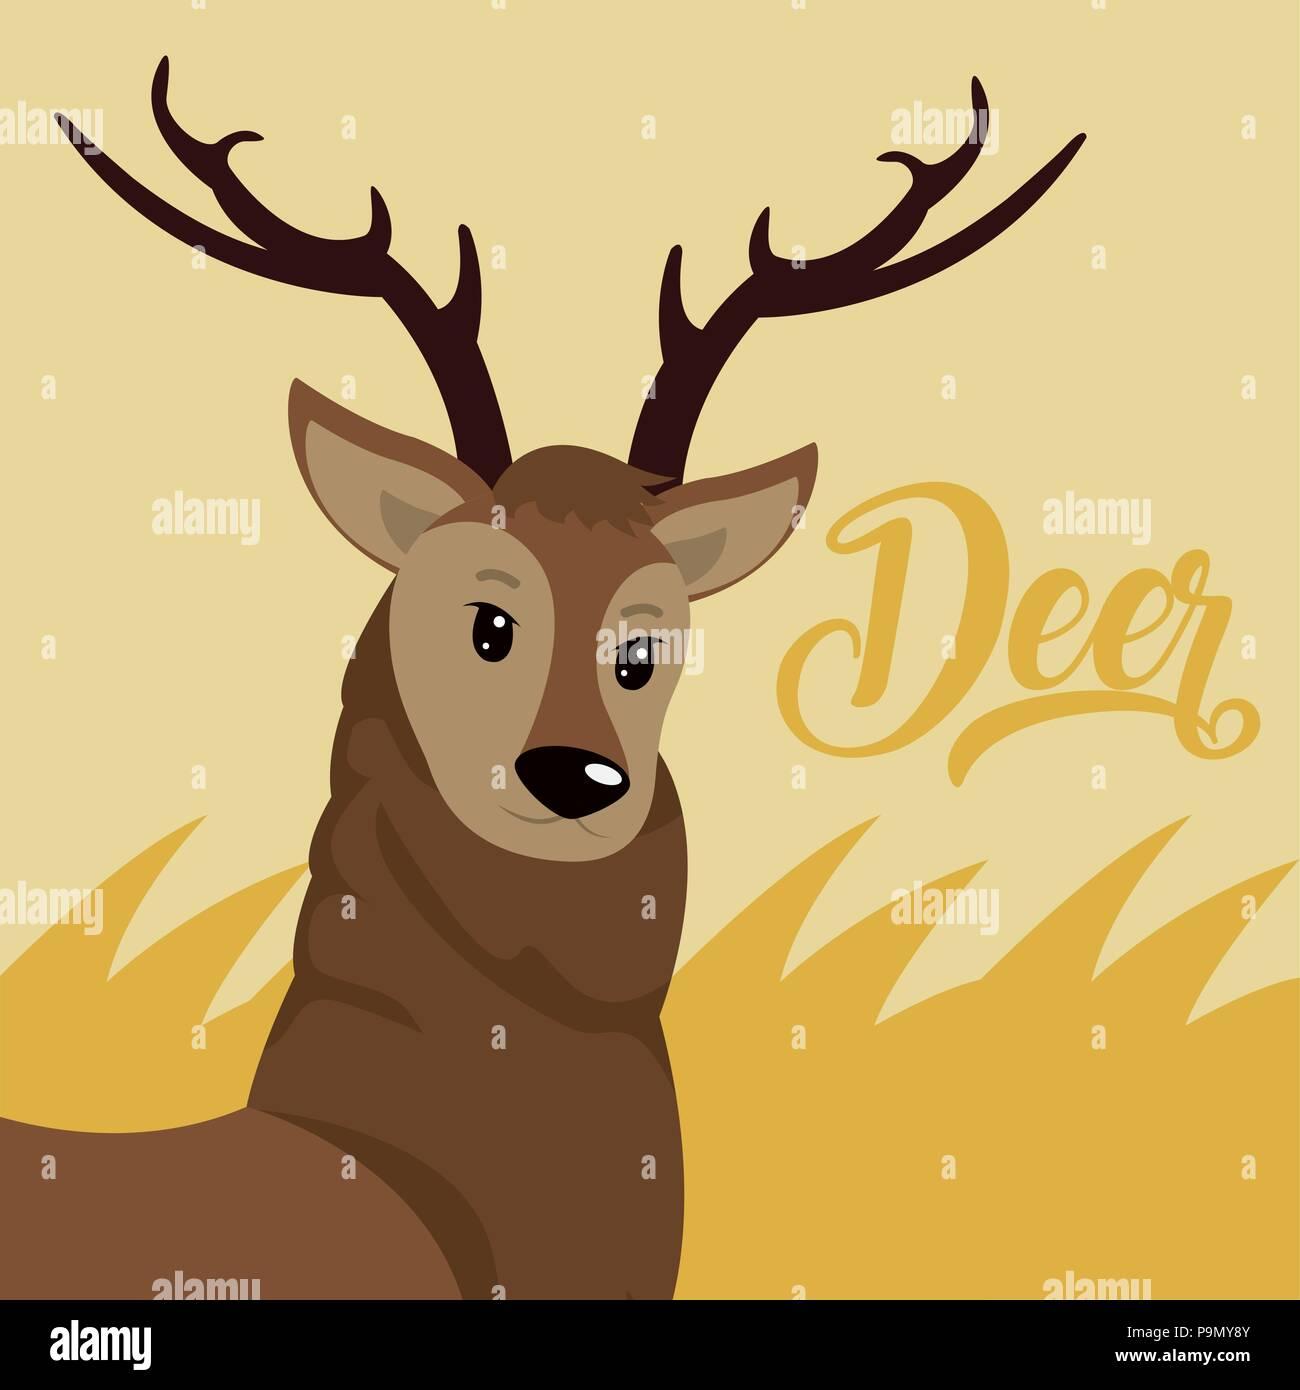 Deer Mascot Stock Photos & Deer Mascot Stock Images - Alamy